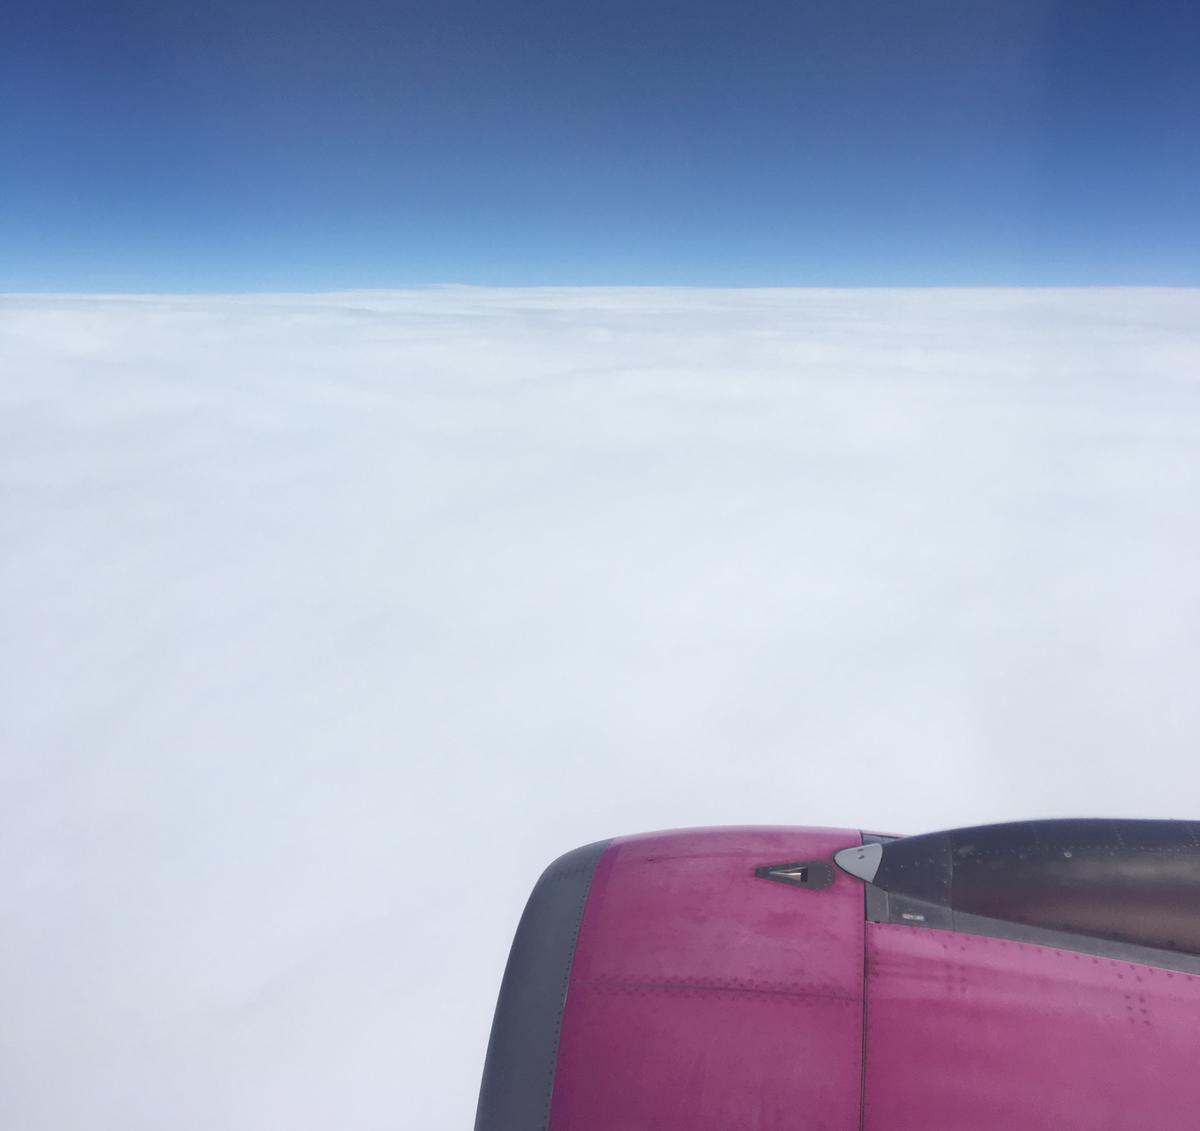 LCC航空会社peachで北海道の新千歳空港へ向かう飛行中3